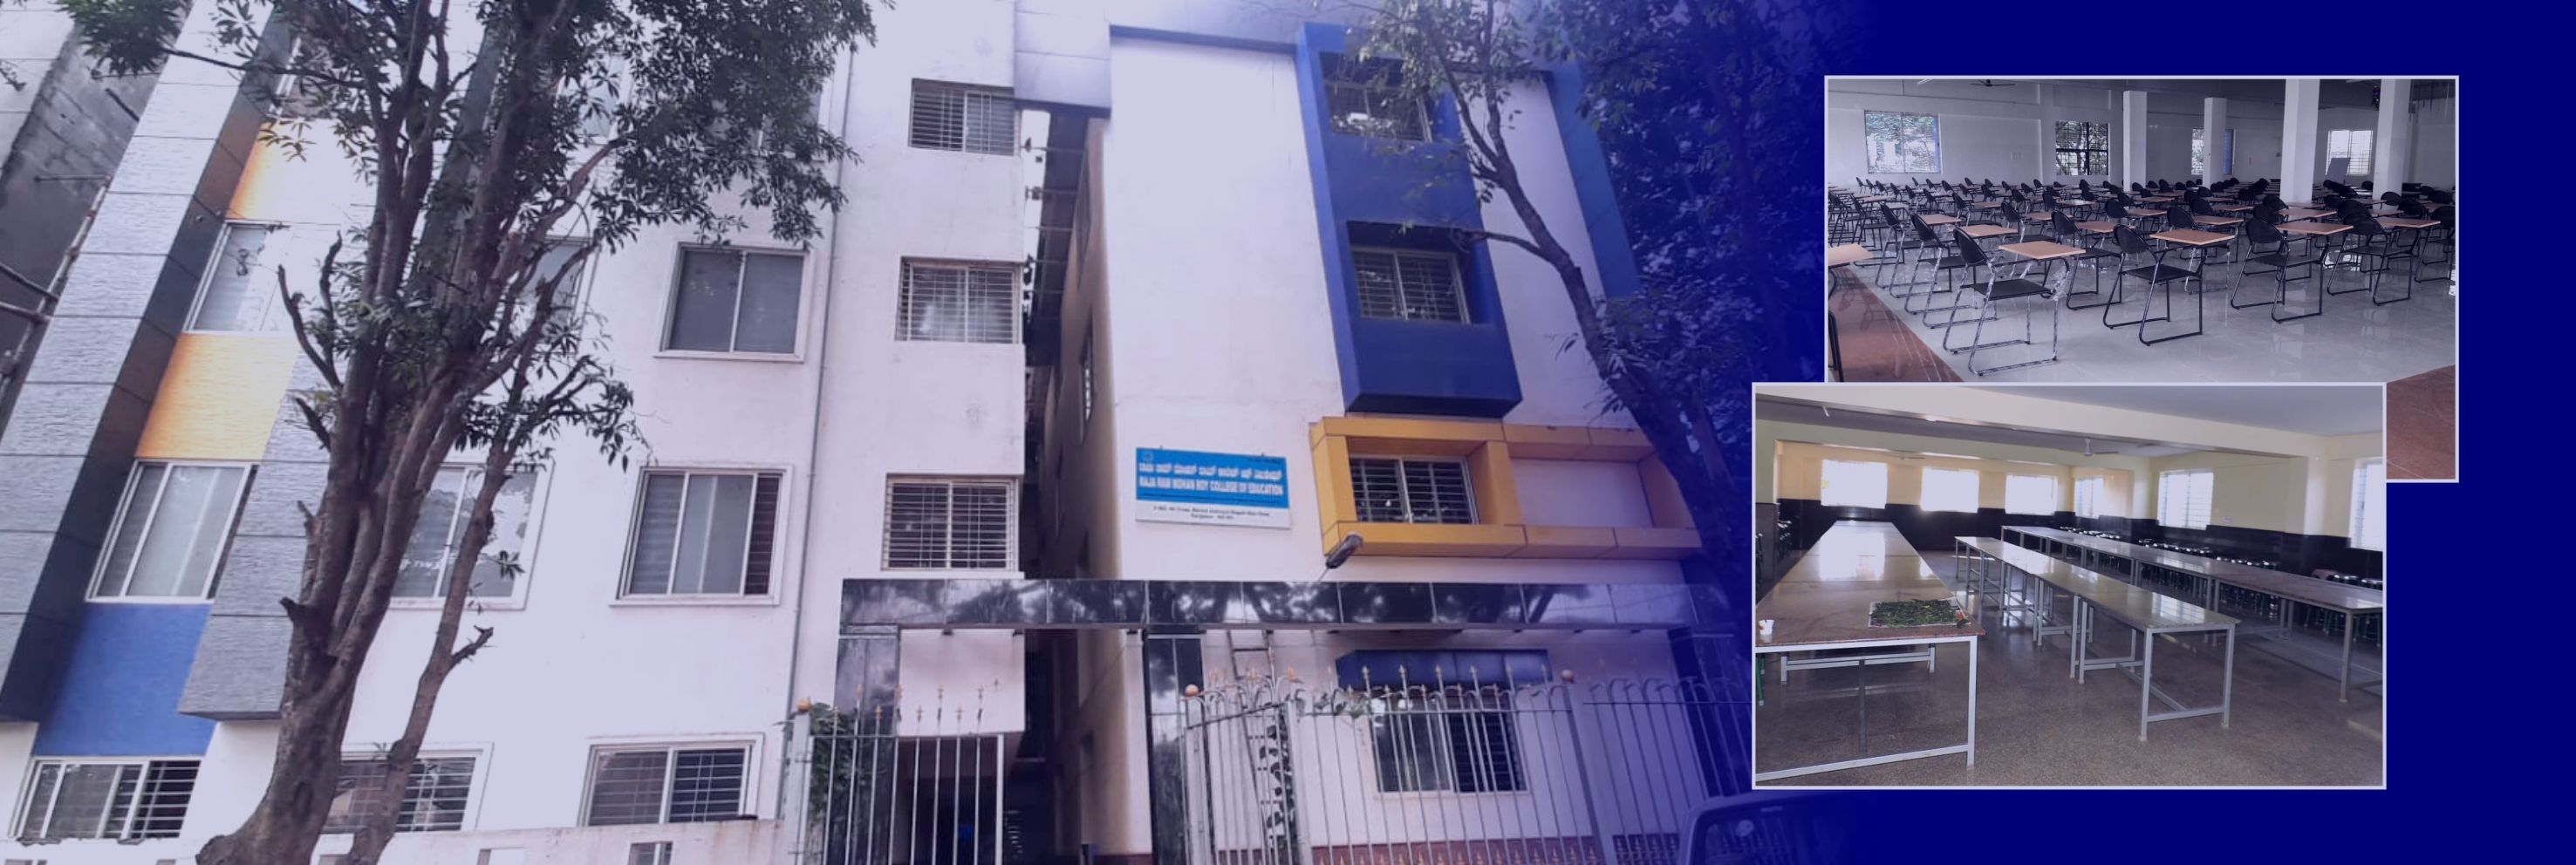 Rsja Ram Mohan Roy College